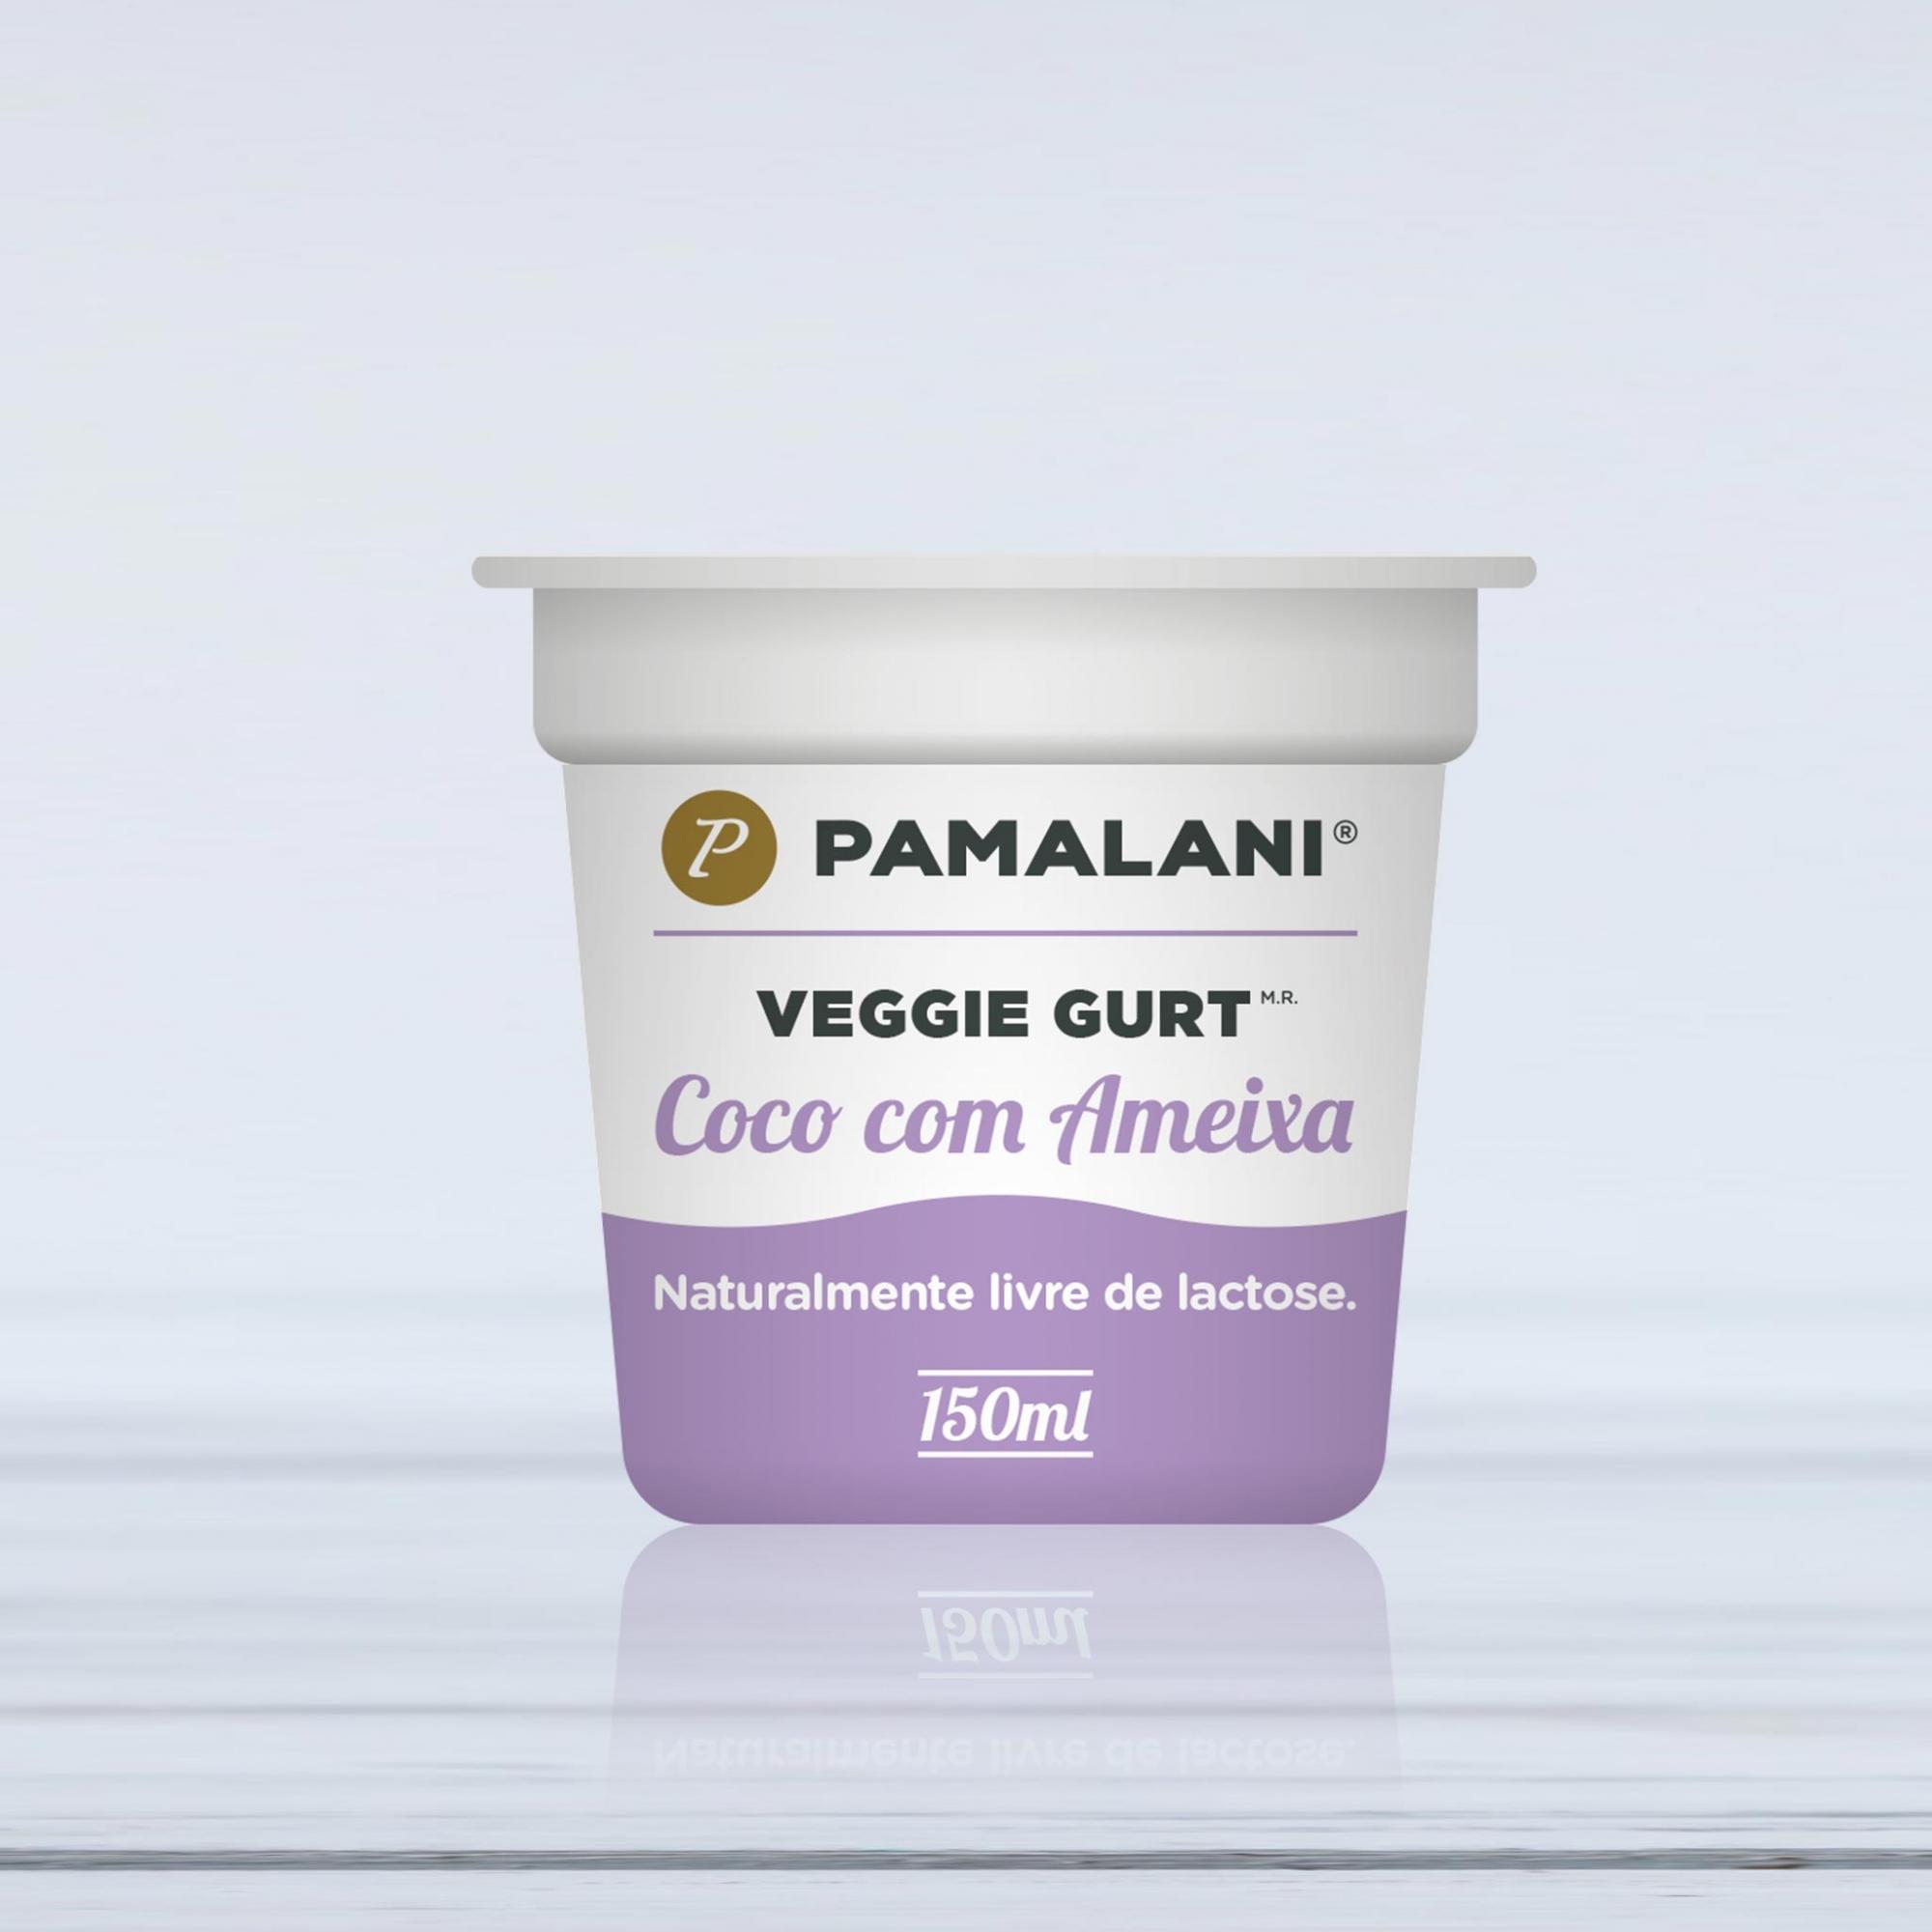 Veggie Gurt Coco com Ameixa 150ml